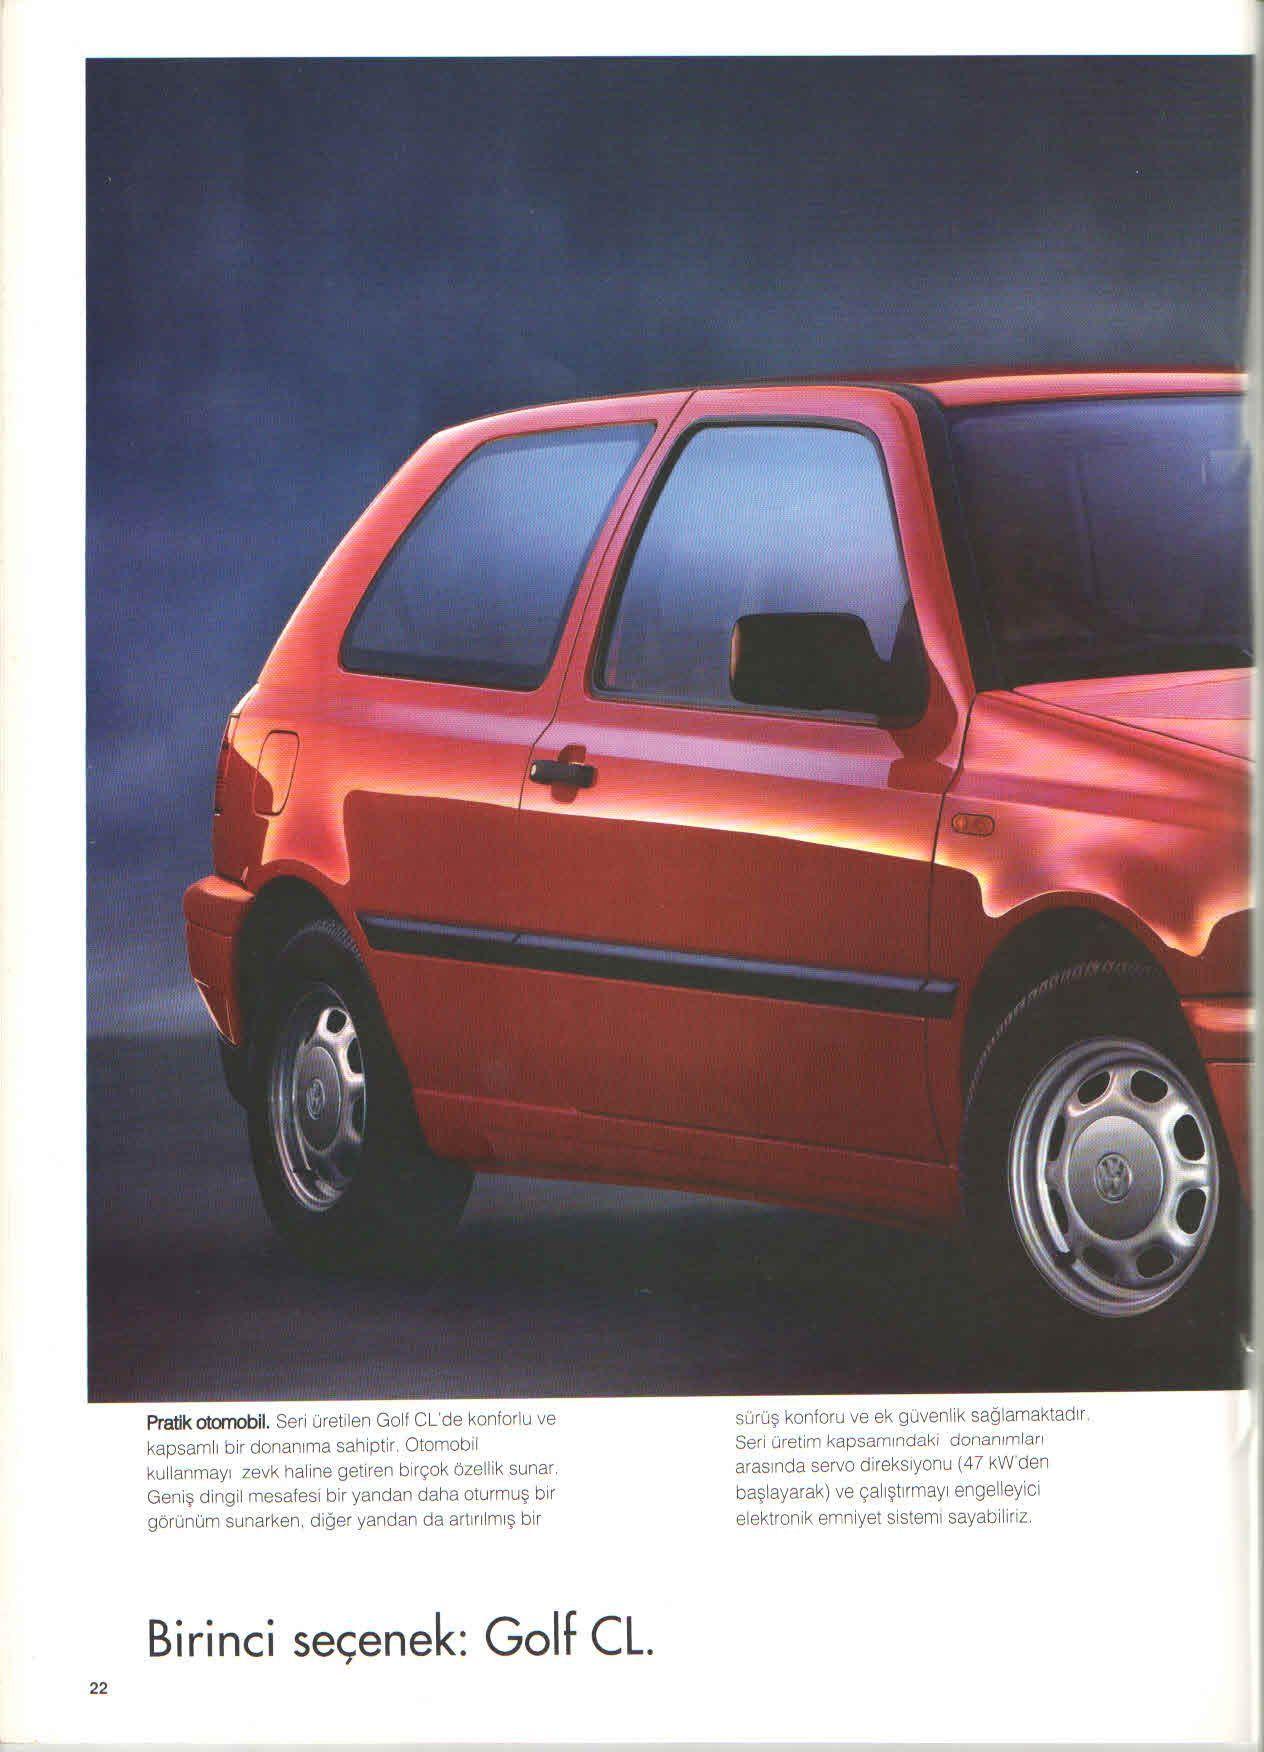 1996 Volkswagen Golf Mk3 Turkish Brochure Catalog Page 22 40